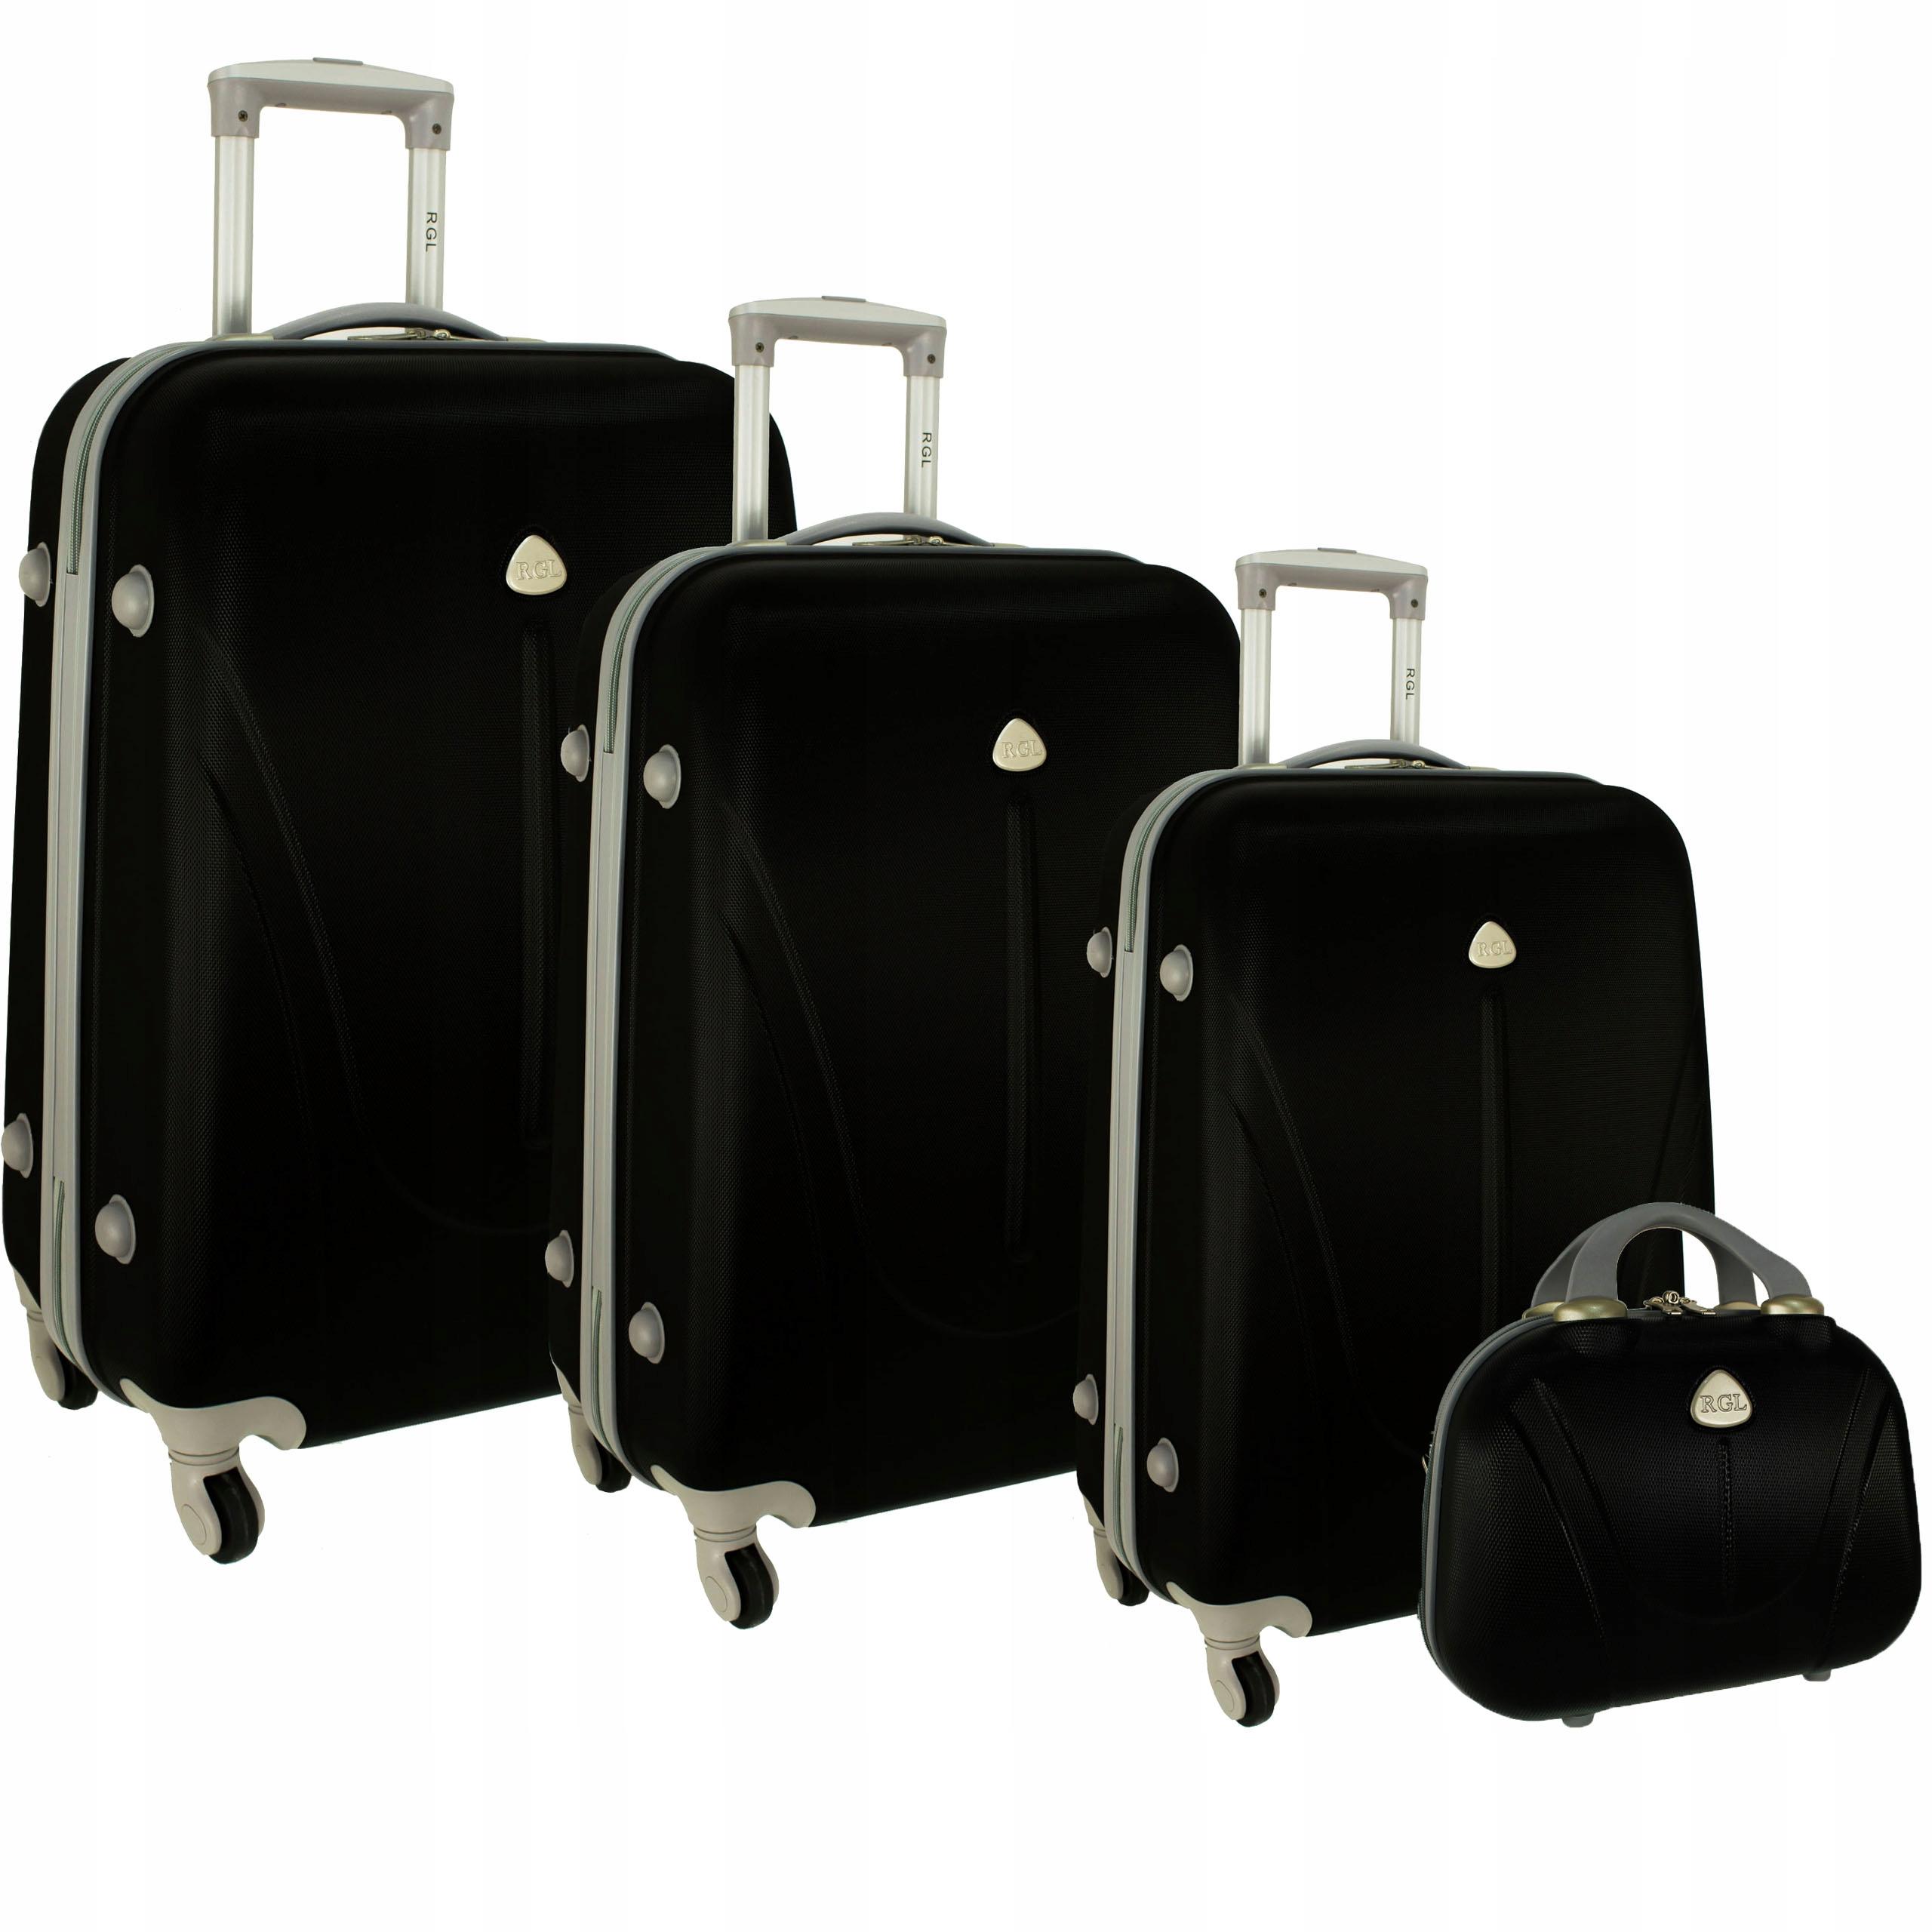 f486c2fd37818 883 RGL Walizki + kuferek walizka podróżna torba - 6897619624 ...